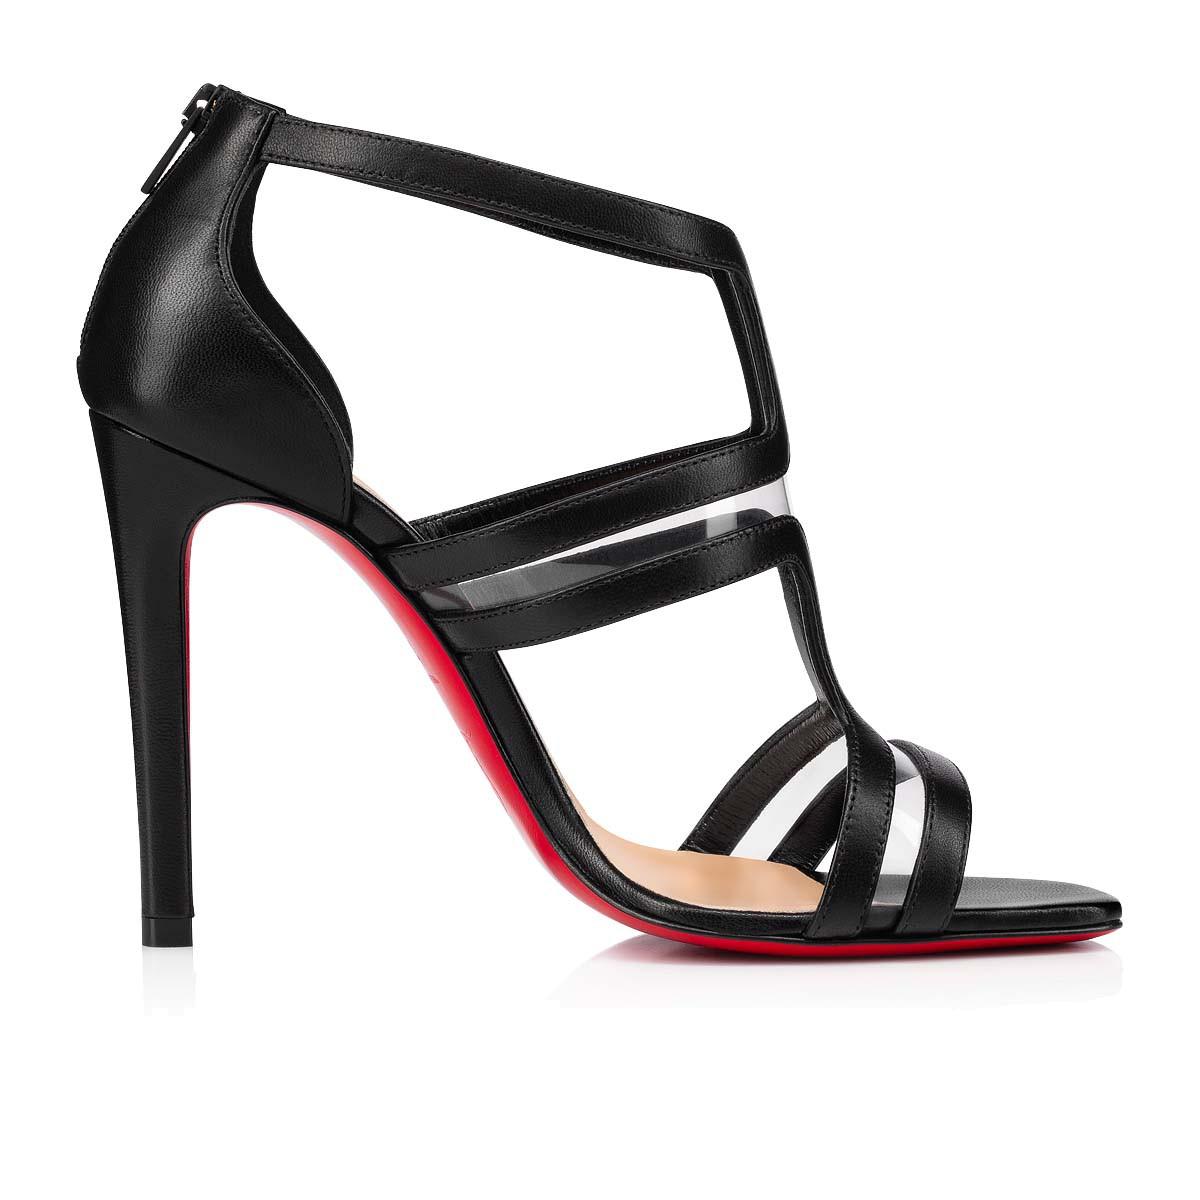 Shoes - Tarlatarte - Christian Louboutin